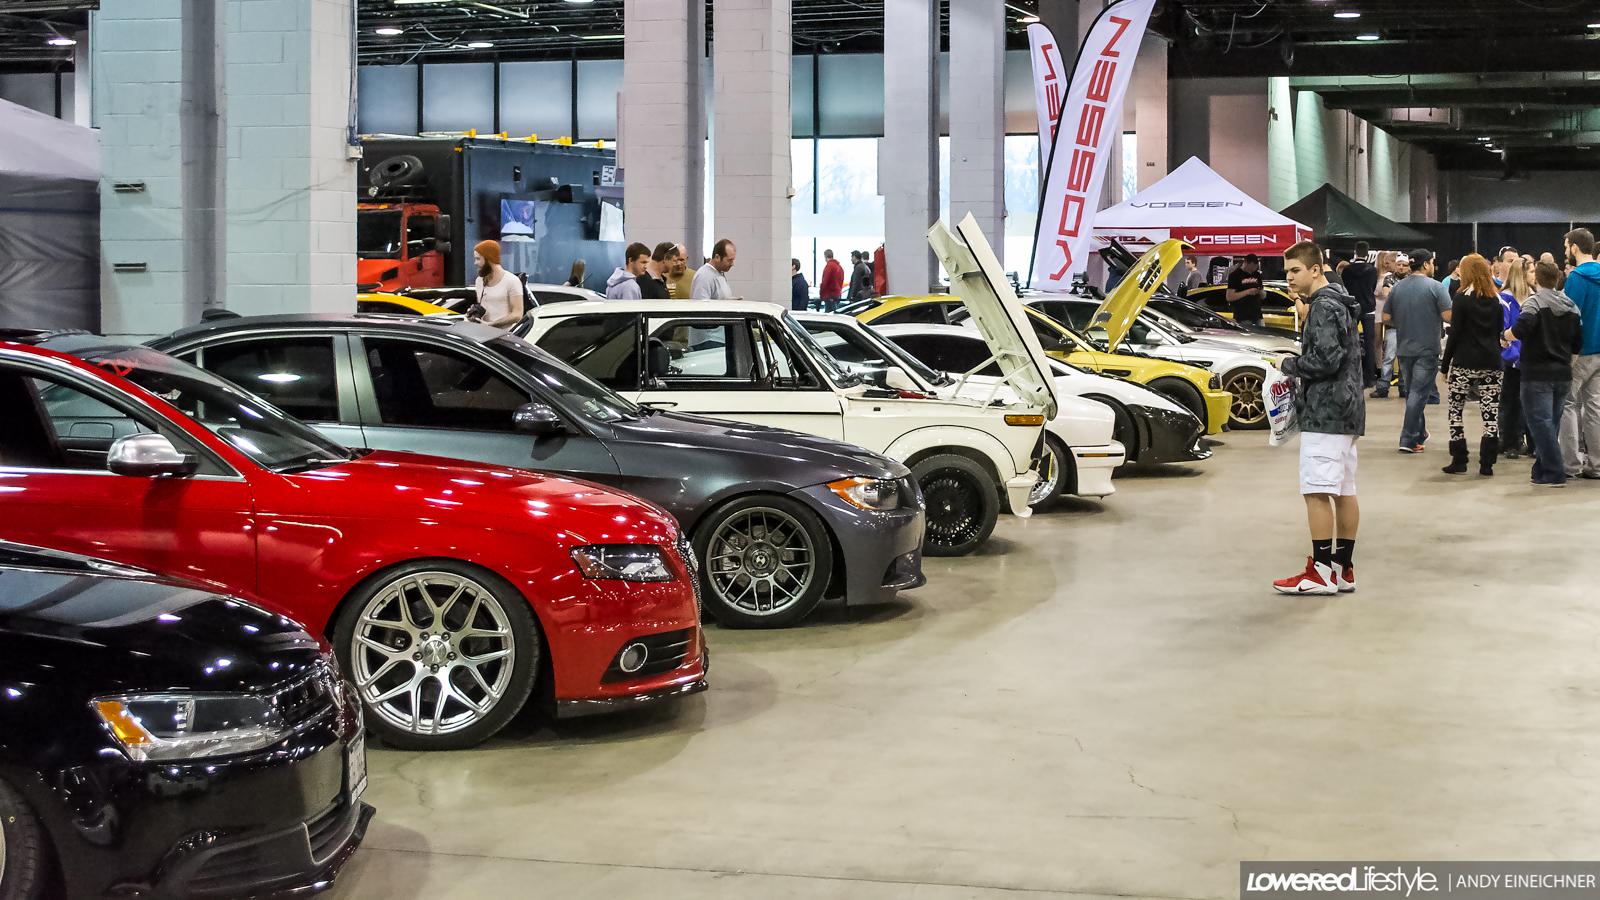 ZIMA Motorsports overview